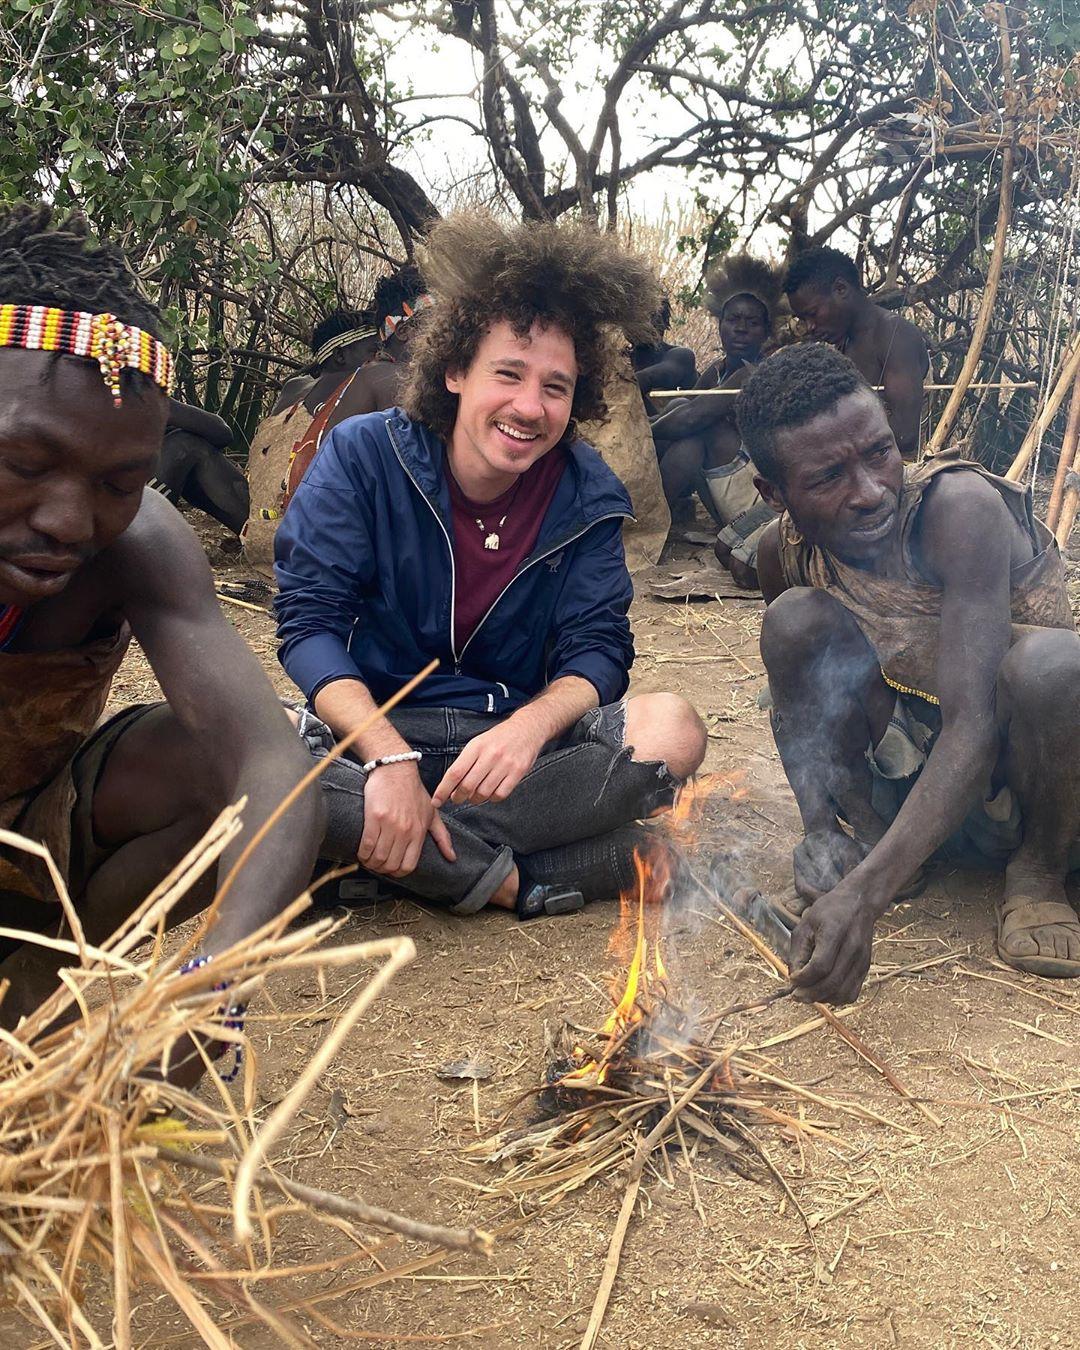 Luisito Comunica fuma marihuana con tribu africana